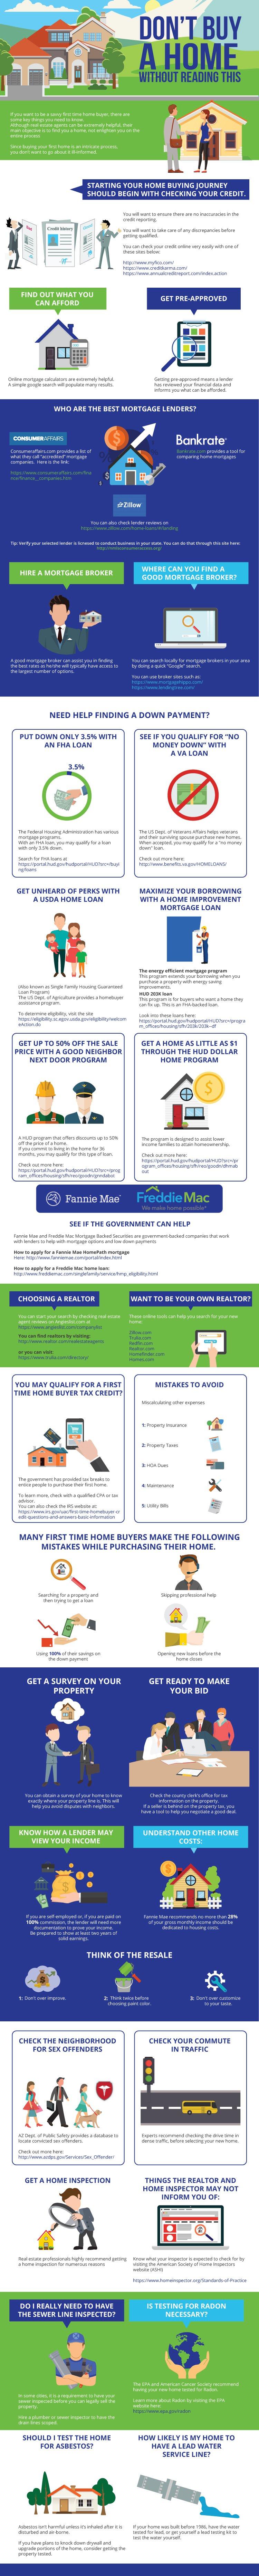 homebuying infographic